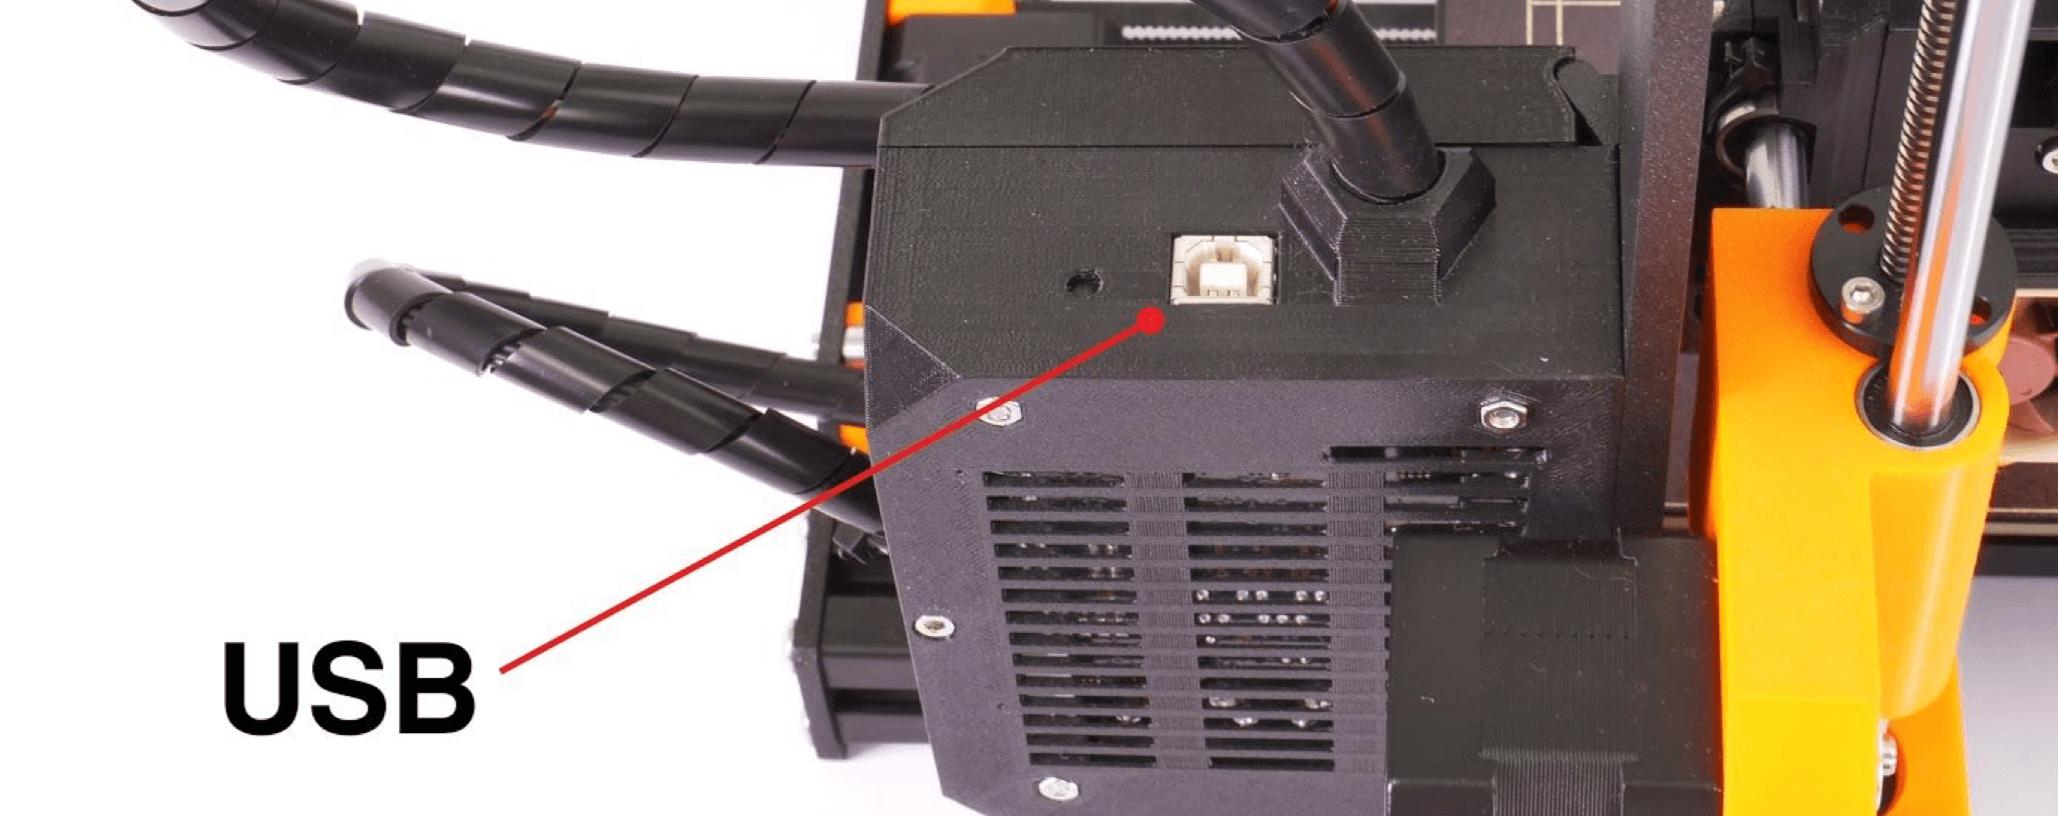 The Original Prusa 3D Printers - Knowledge base - Firmware